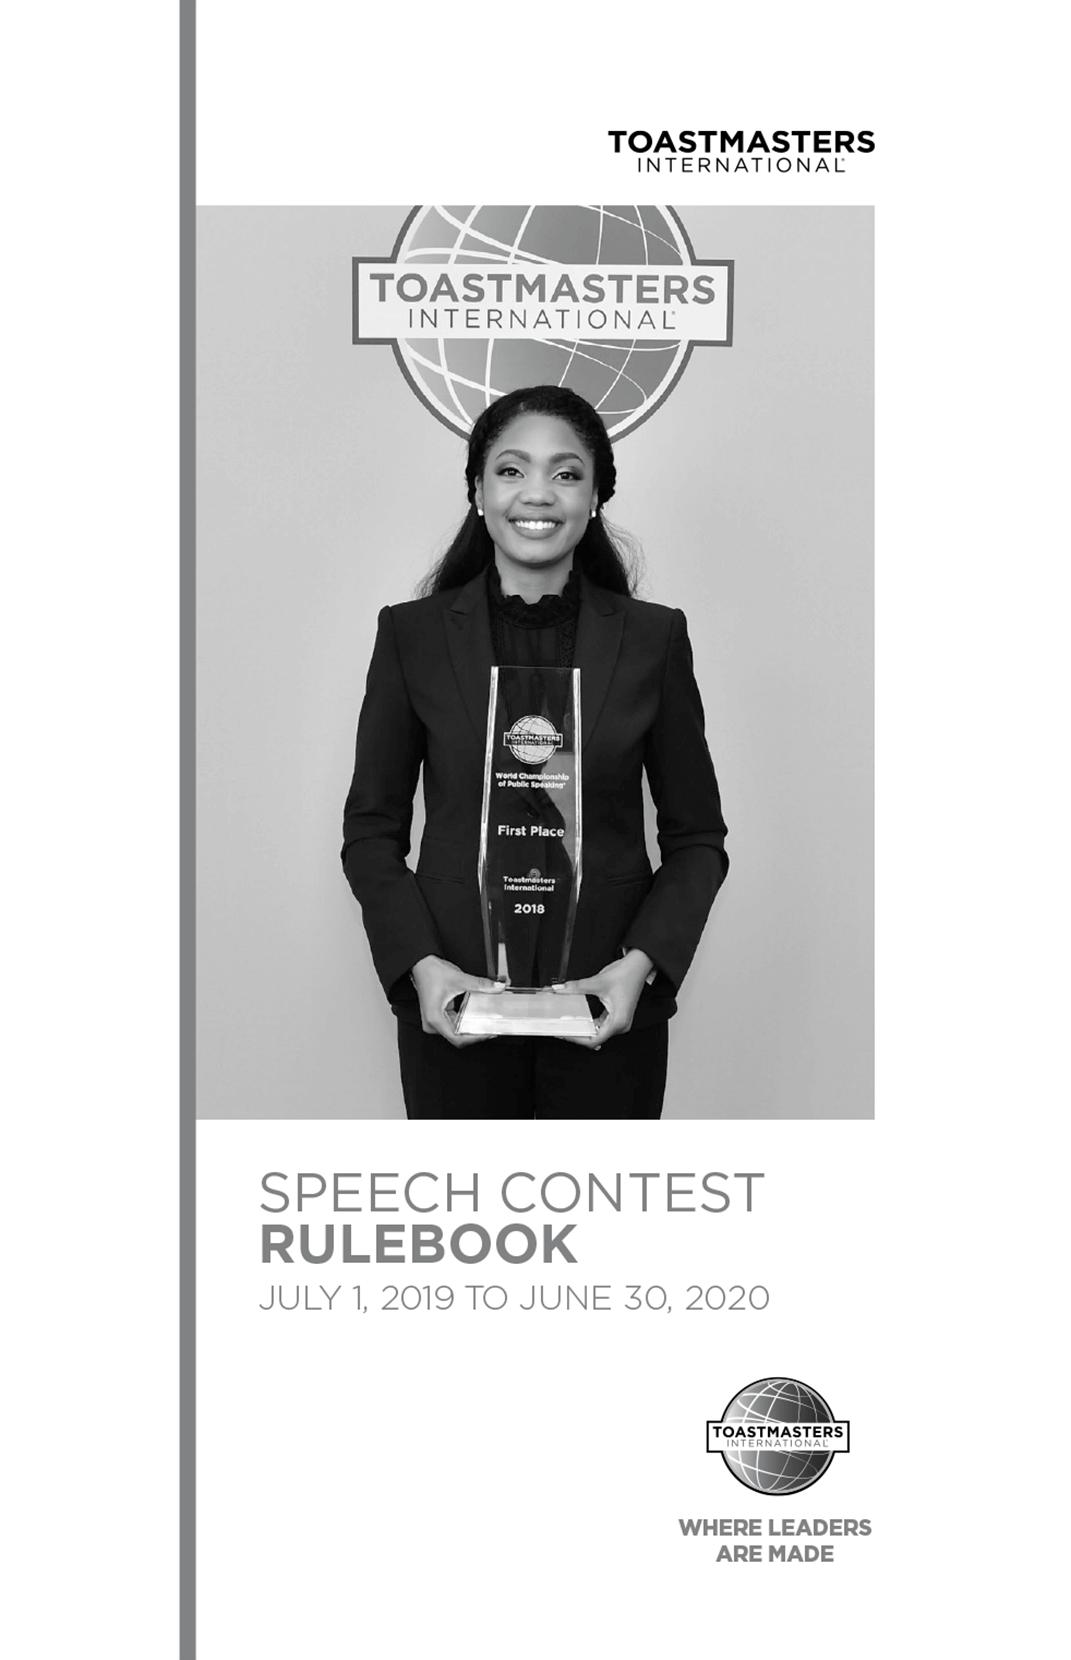 Speech Contest Rulebook